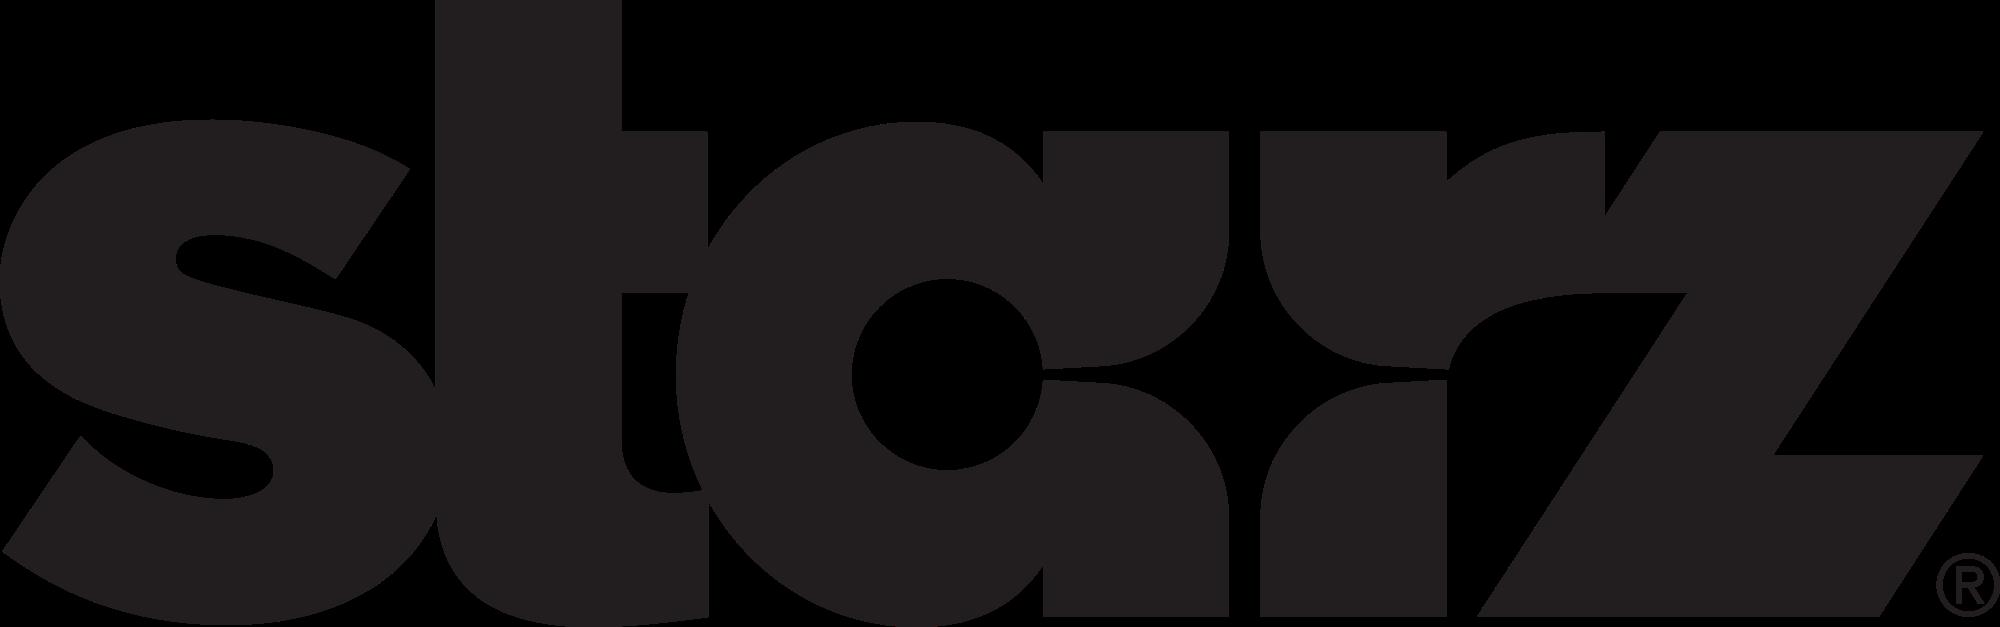 Starz Tv Starz Vector Logo Logos